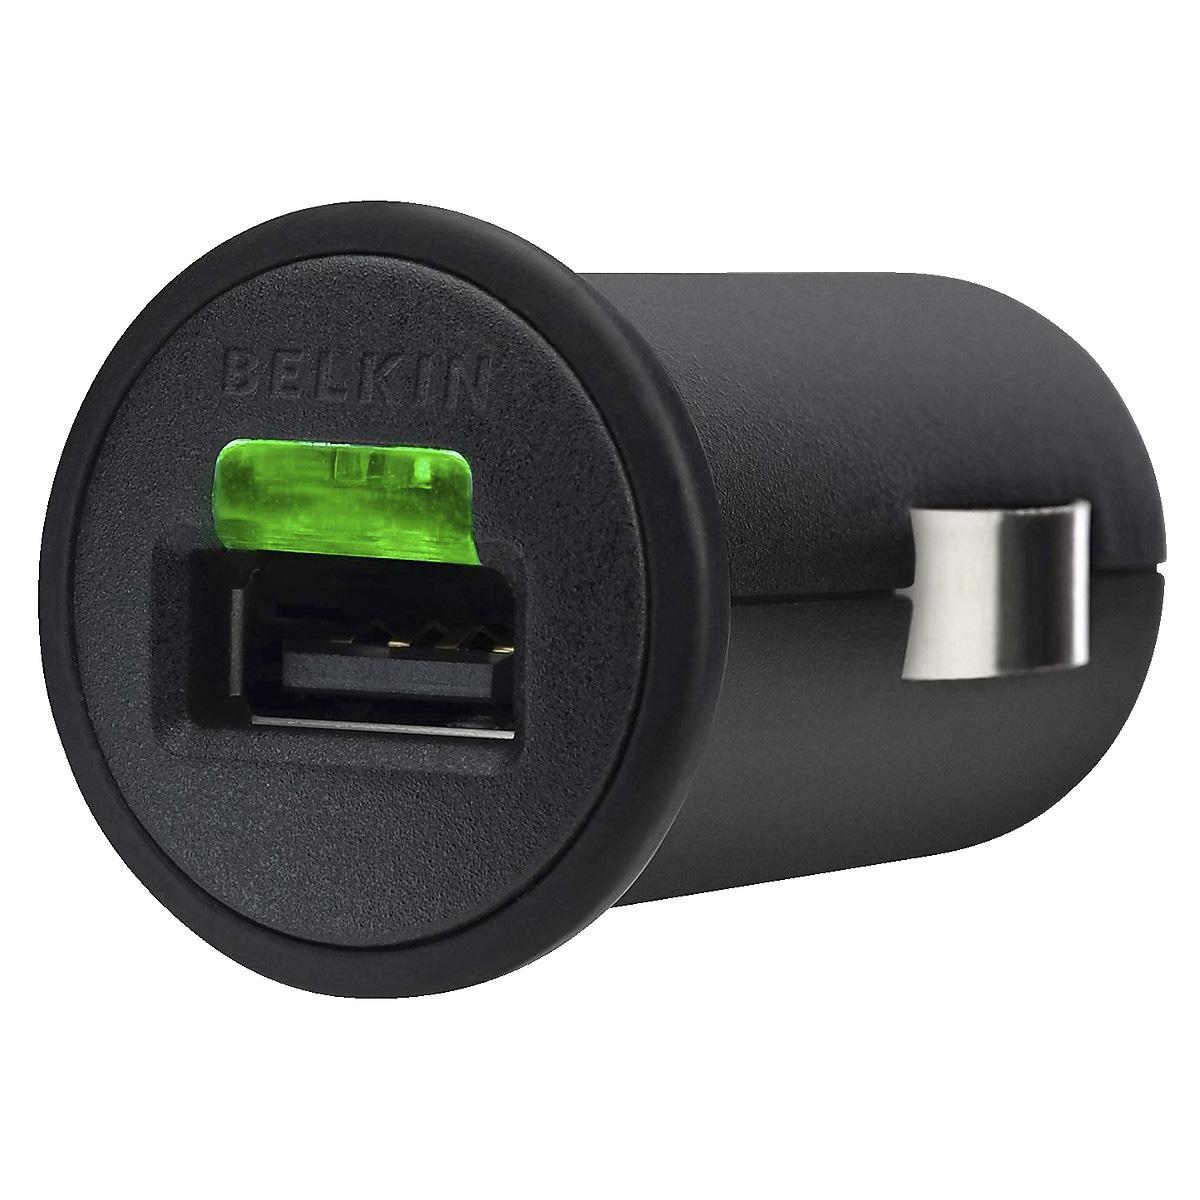 12 V-laddare för iPod/iPhone/iPad, Belkin